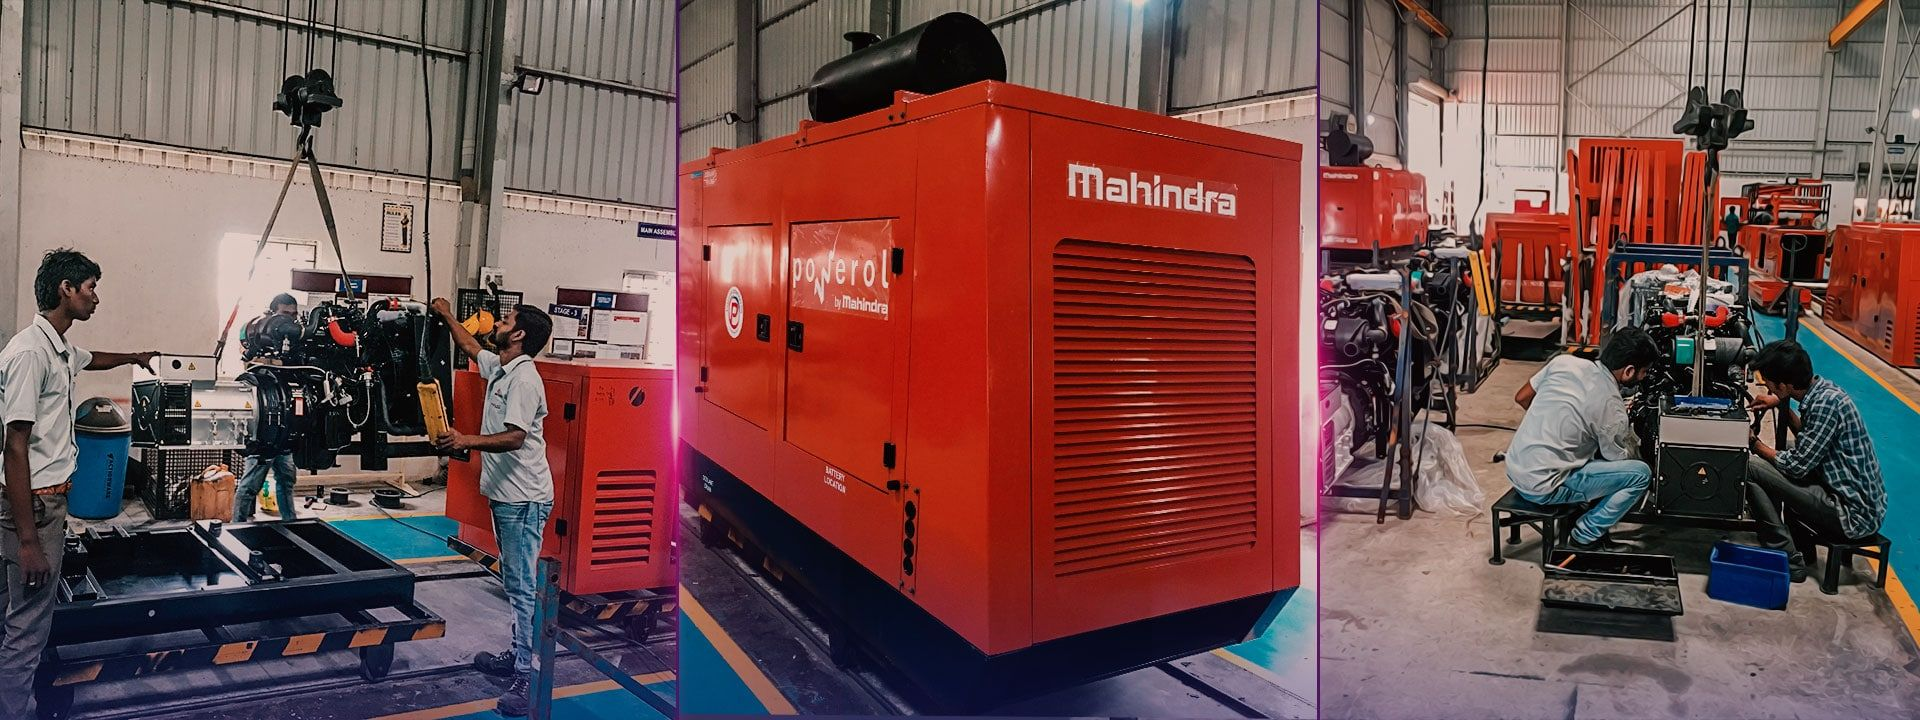 Mahindra Generator Dealers in chennai